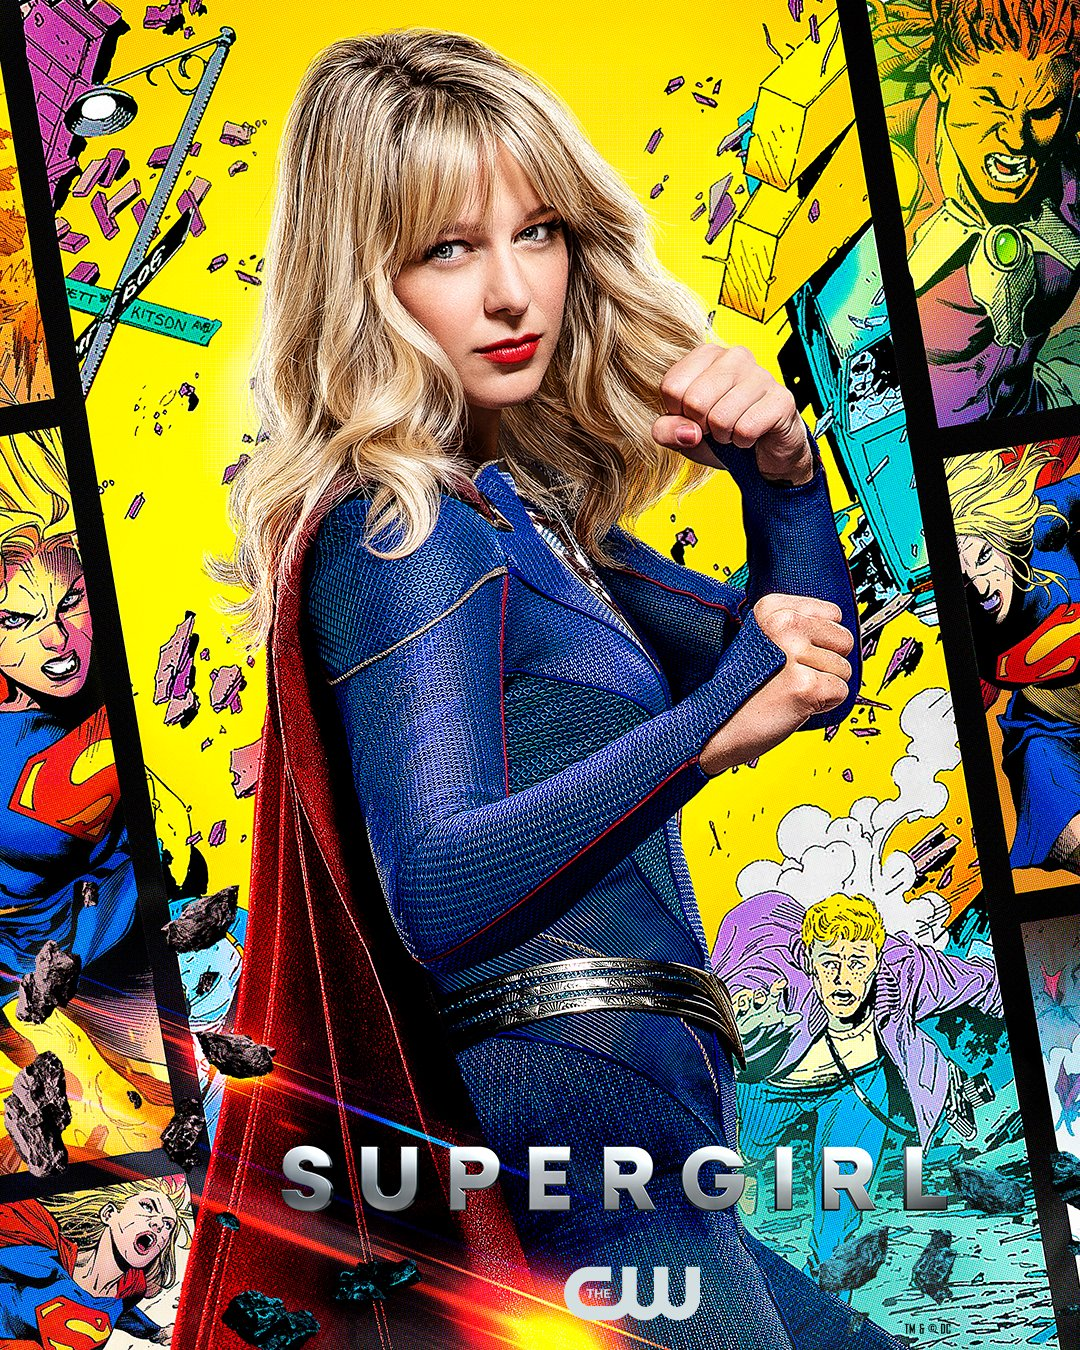 Supergirl (Melissa Benoist) en un póster de Supergirl. Imagen: Supergirl Twitter (@TheCWSupergirl).